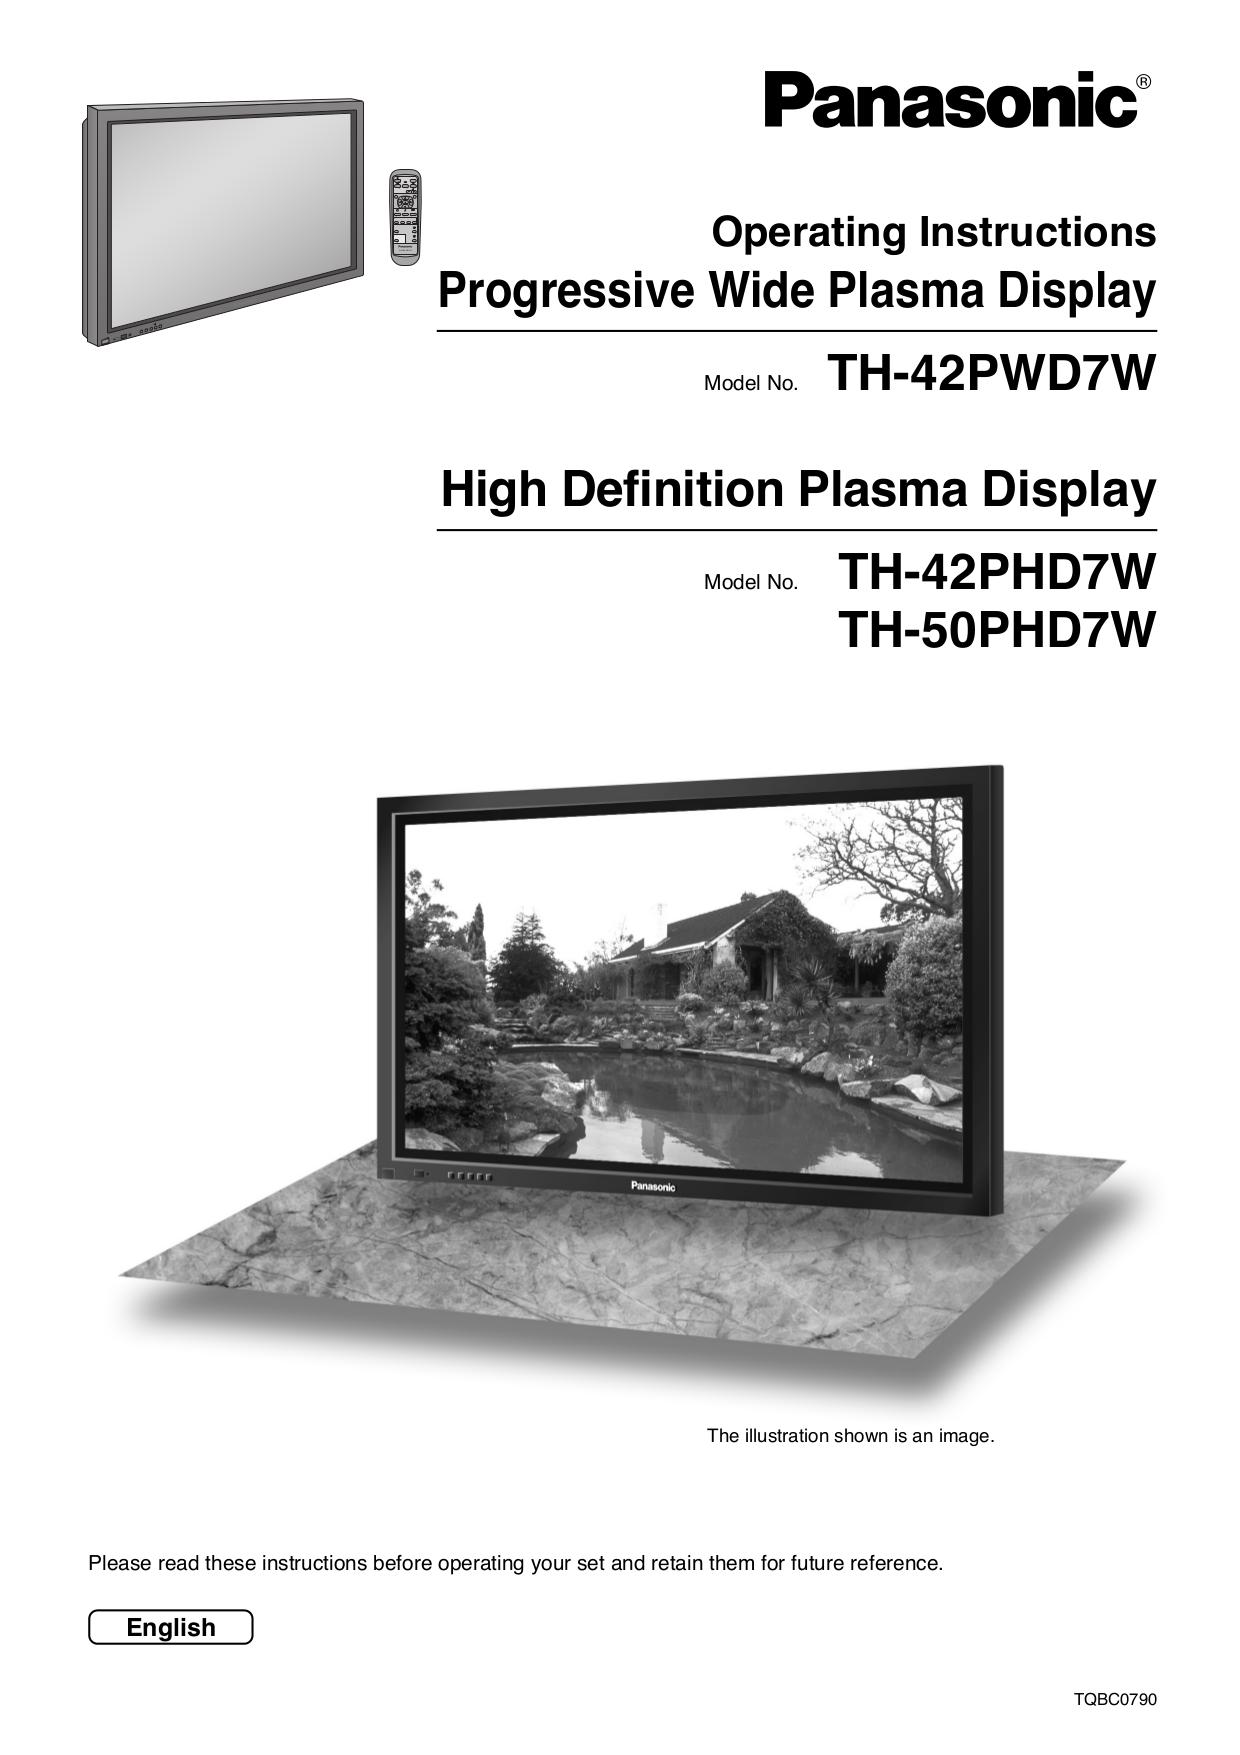 Download free pdf for Panasonic Viera TH-42PWD7 TV manual